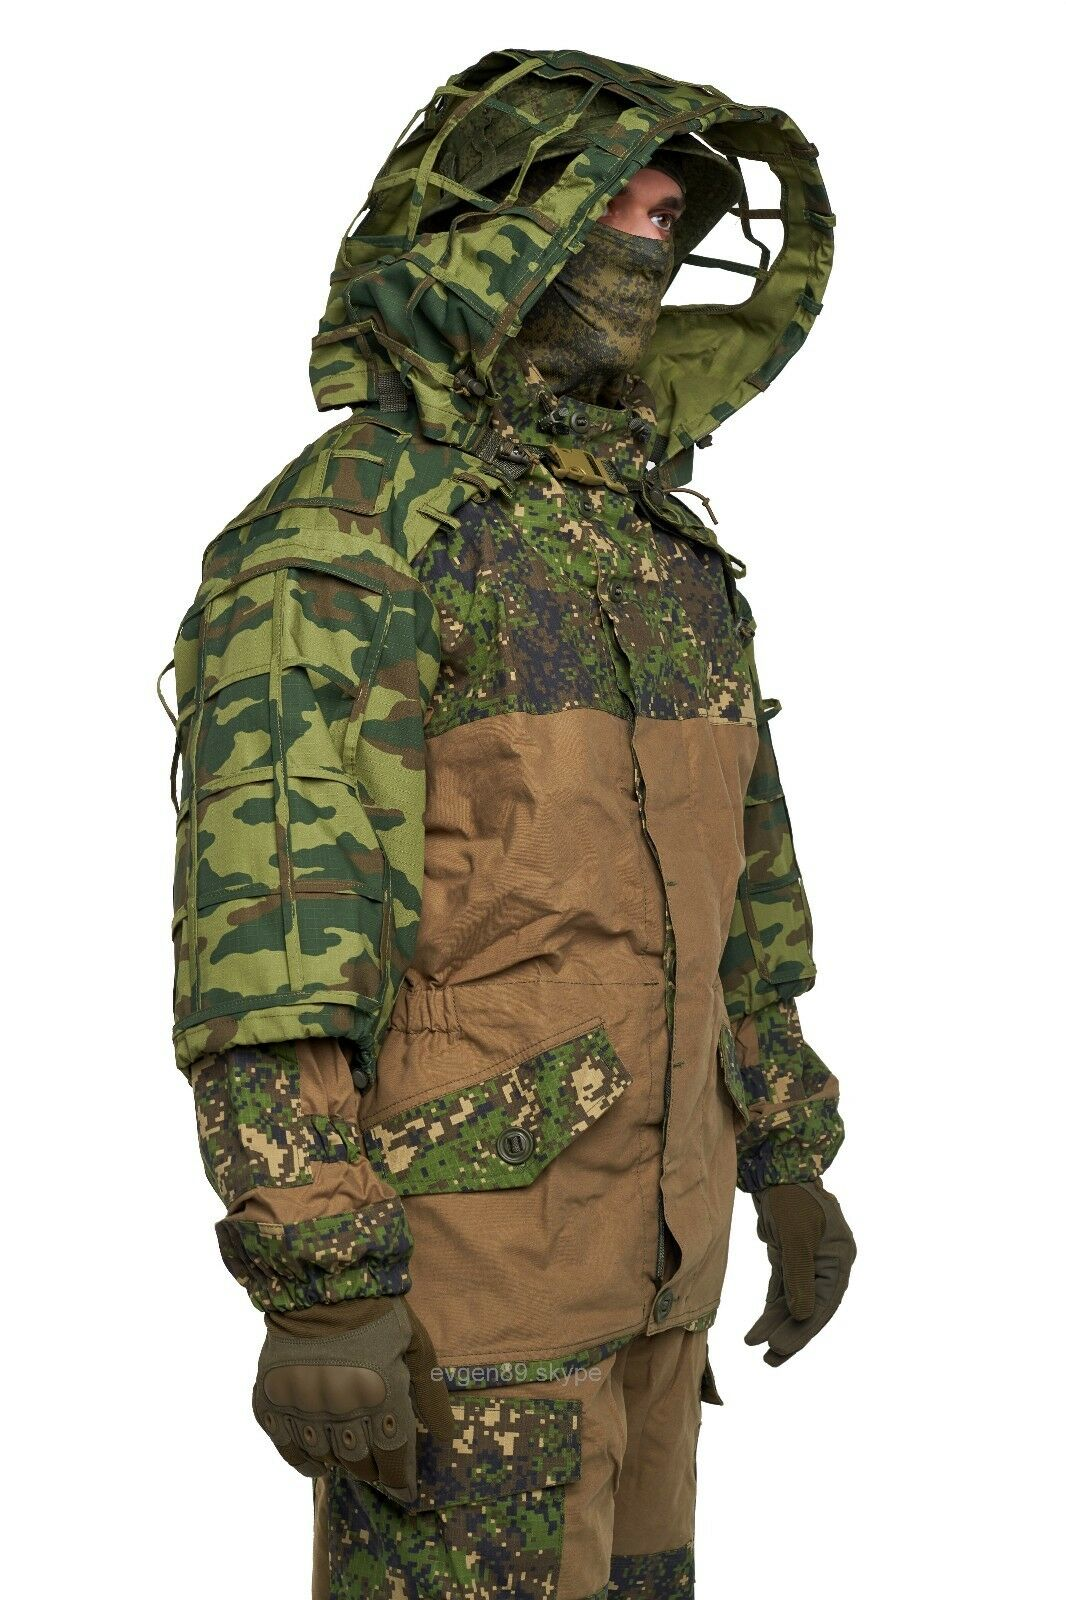 Disguise Sniper Coat   Scorpion    Viper Hood Flora VSR-98 by Giena Tactics  cheap online